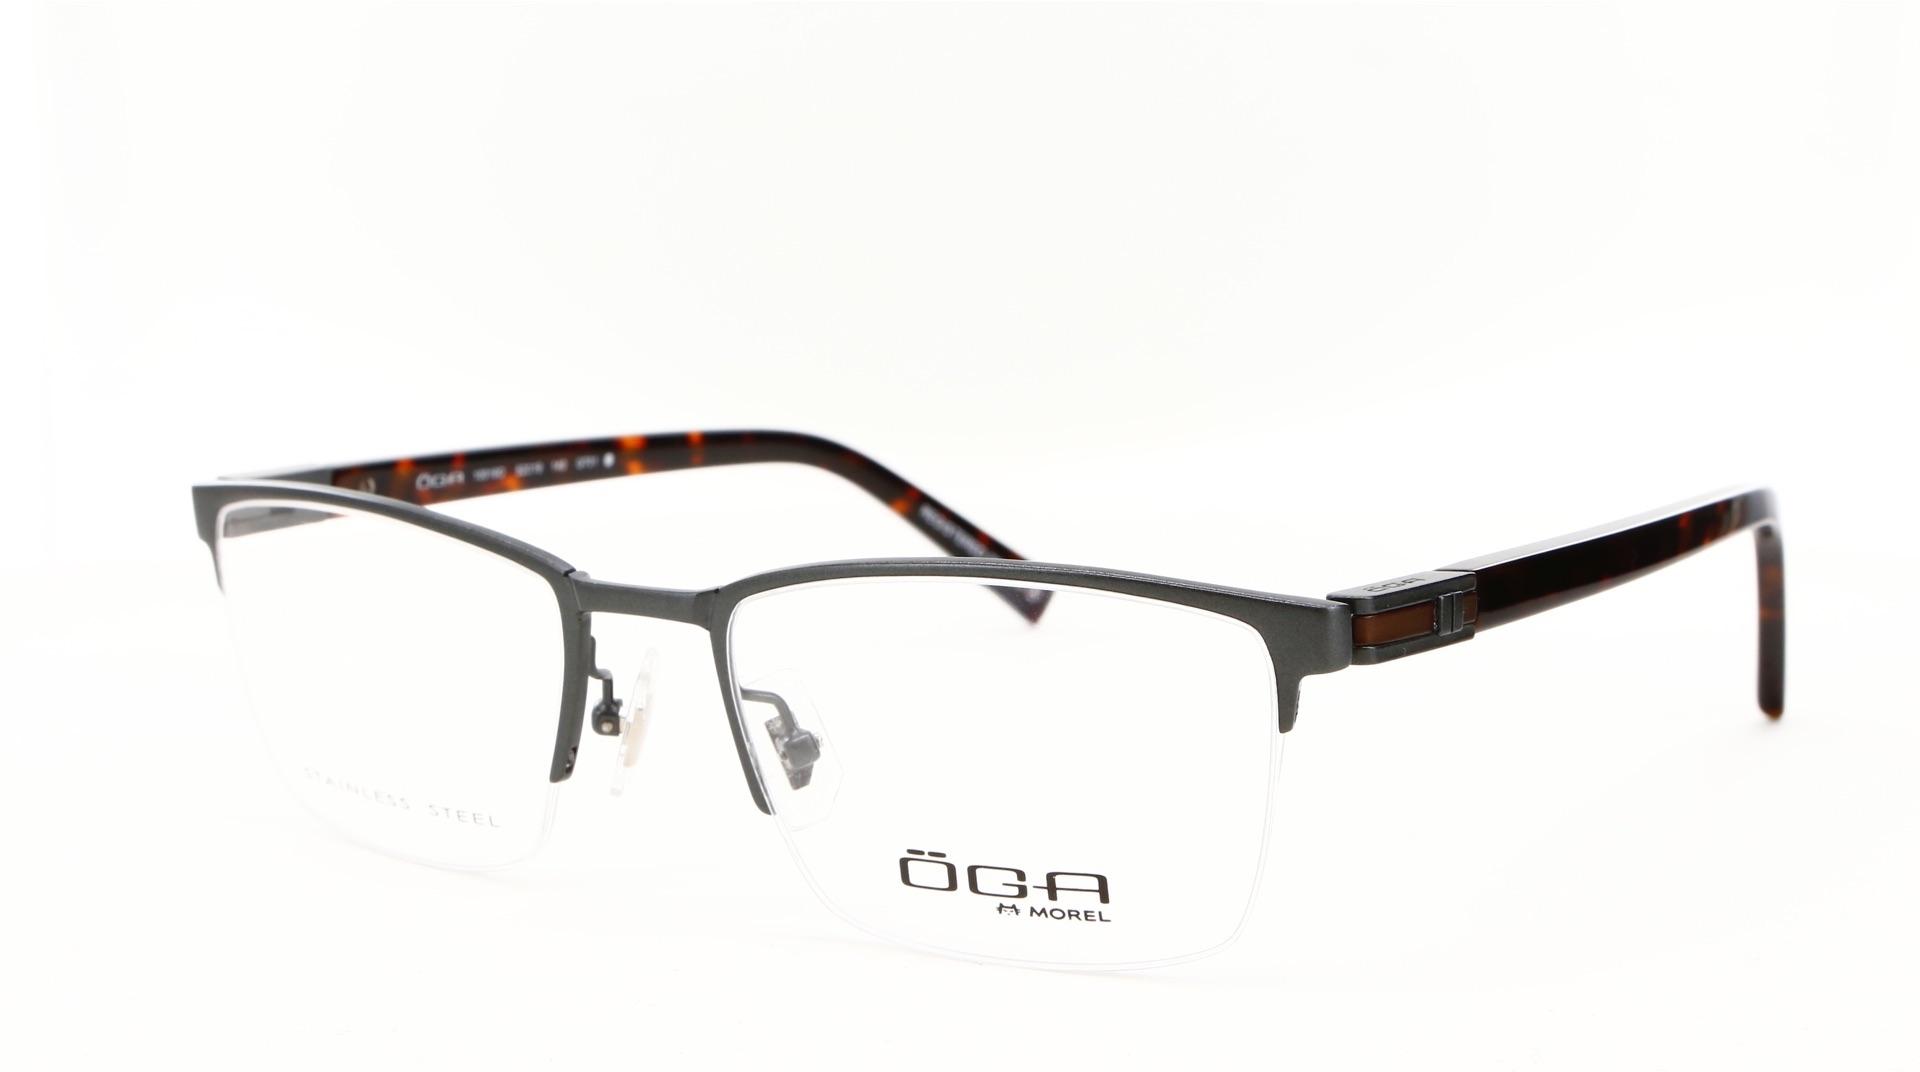 OGA - ref: 78967